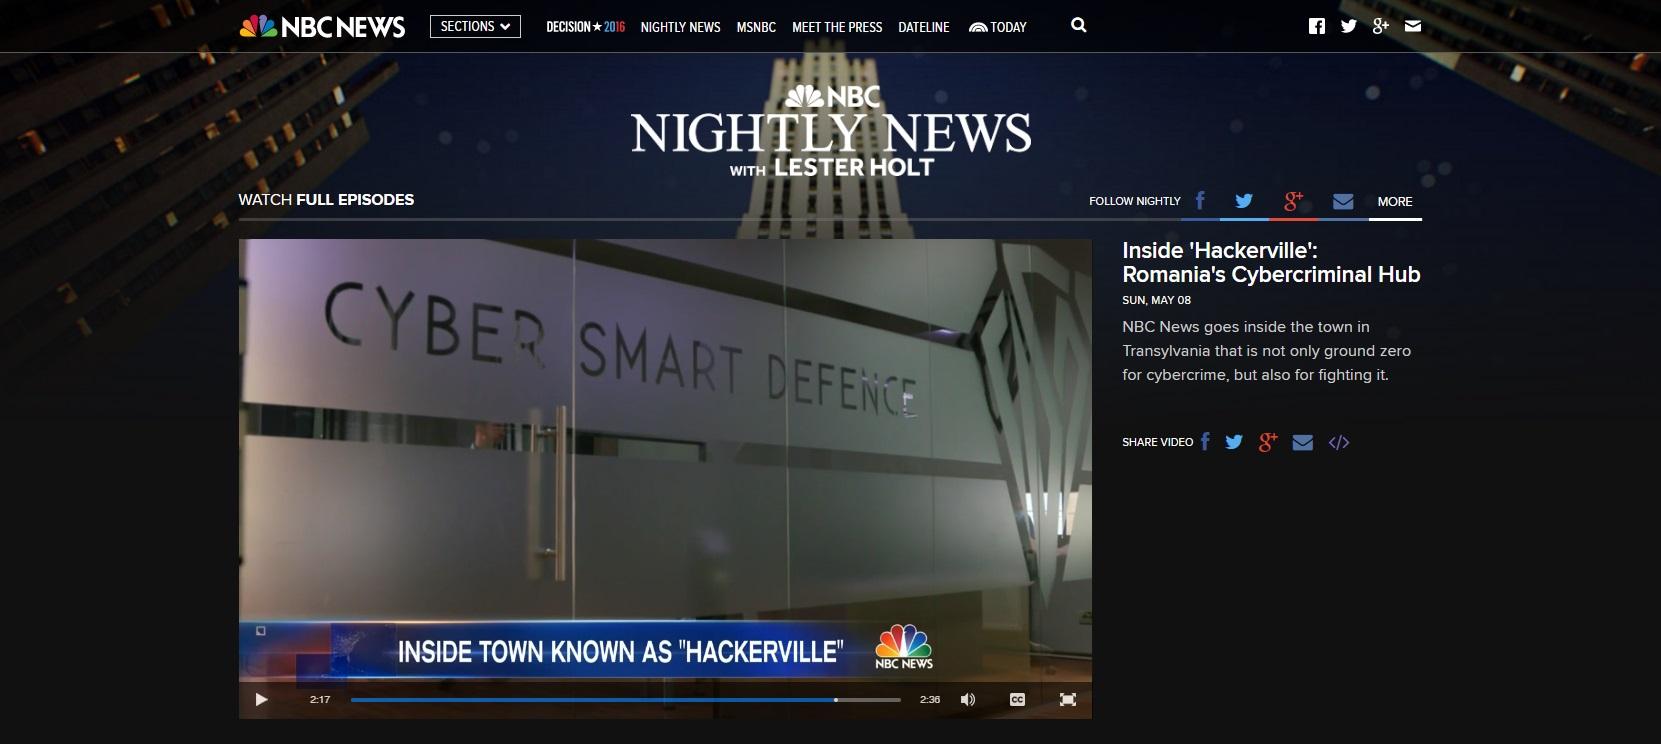 csd-on-nbc-news